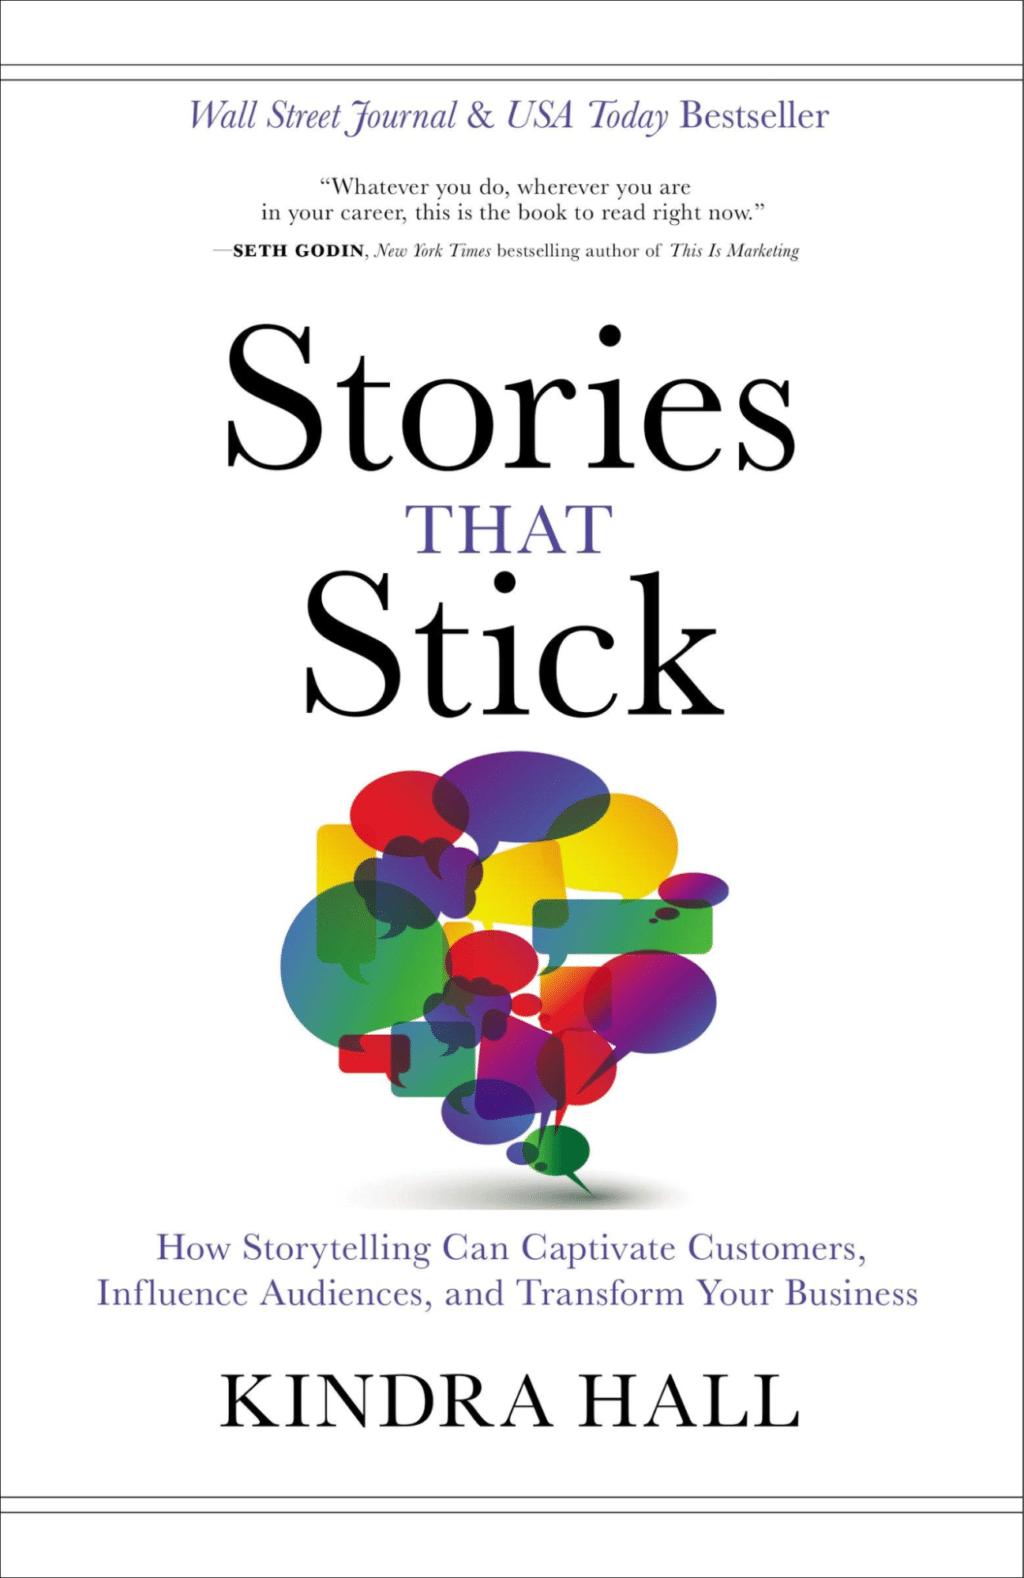 Best Marketing Books 2021: Stories That Stick